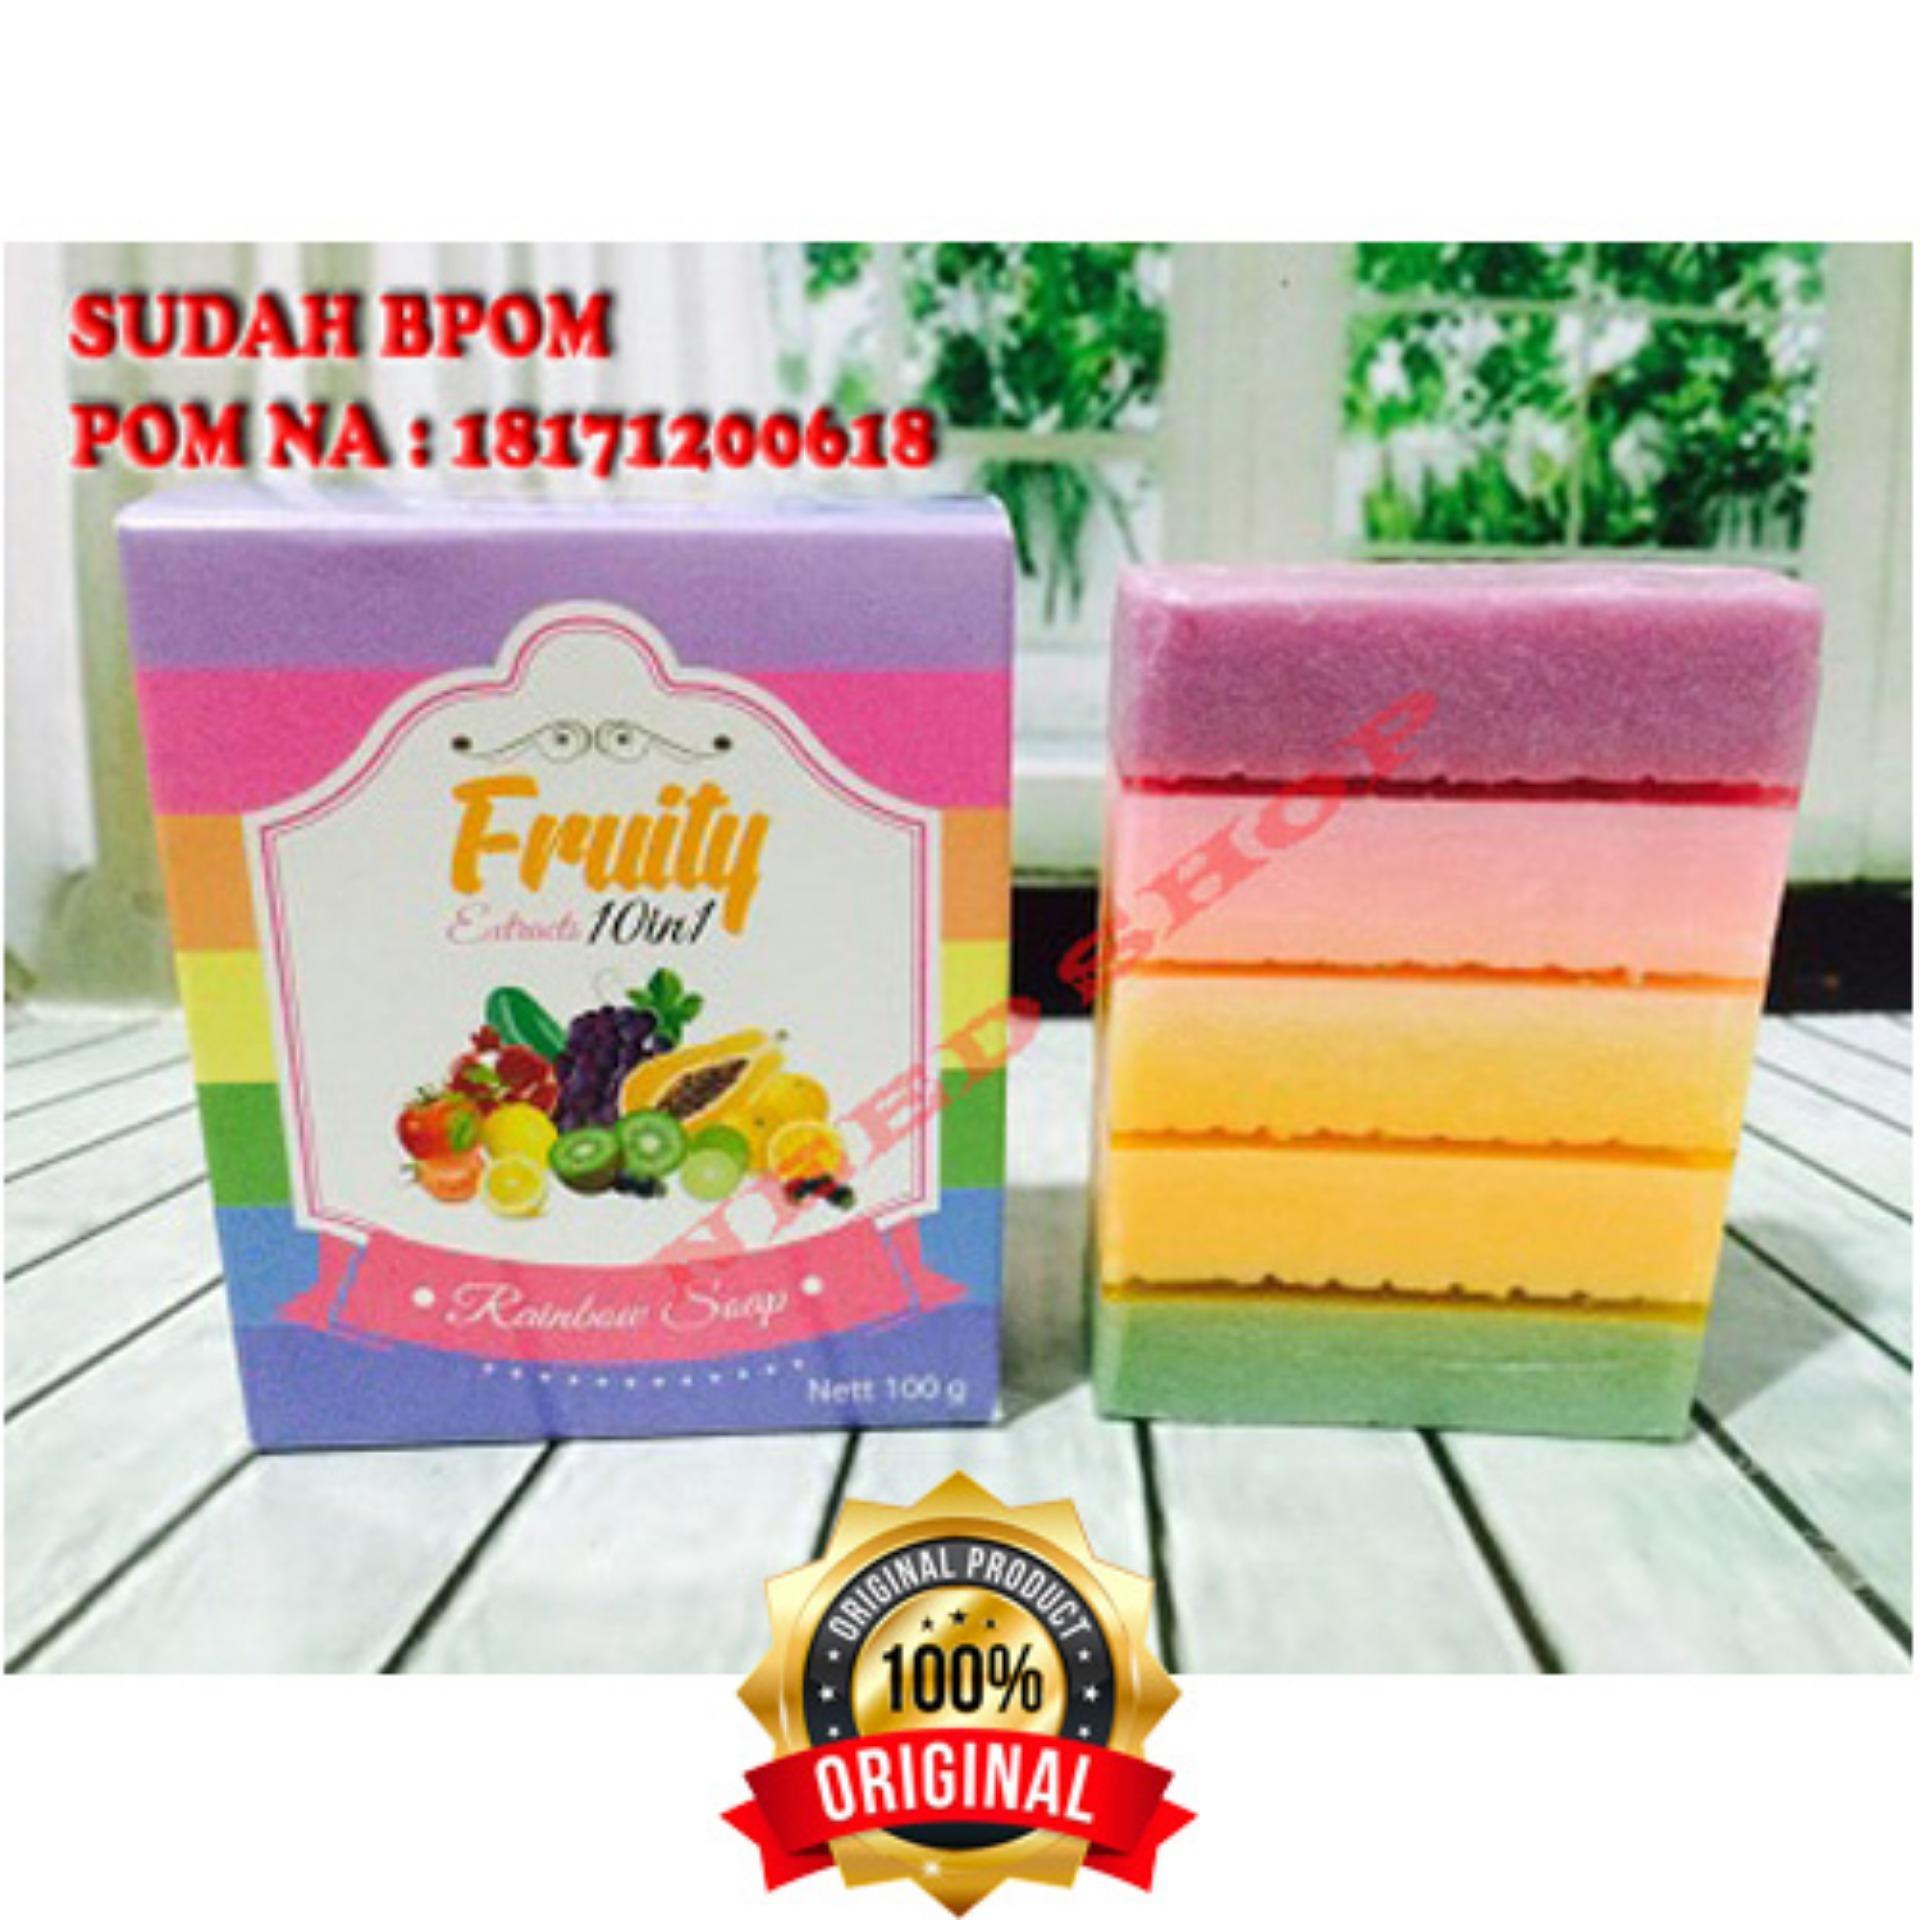 HOKI COD - Fruity Rainbow Soap 10 in 1 Whitening Soap Fruitamin Original Sabun Pemutih Badan BPOM + Gratis Pulpen Lilin Unik Serba Guna Hitam Pekat - 1 Pcs ...